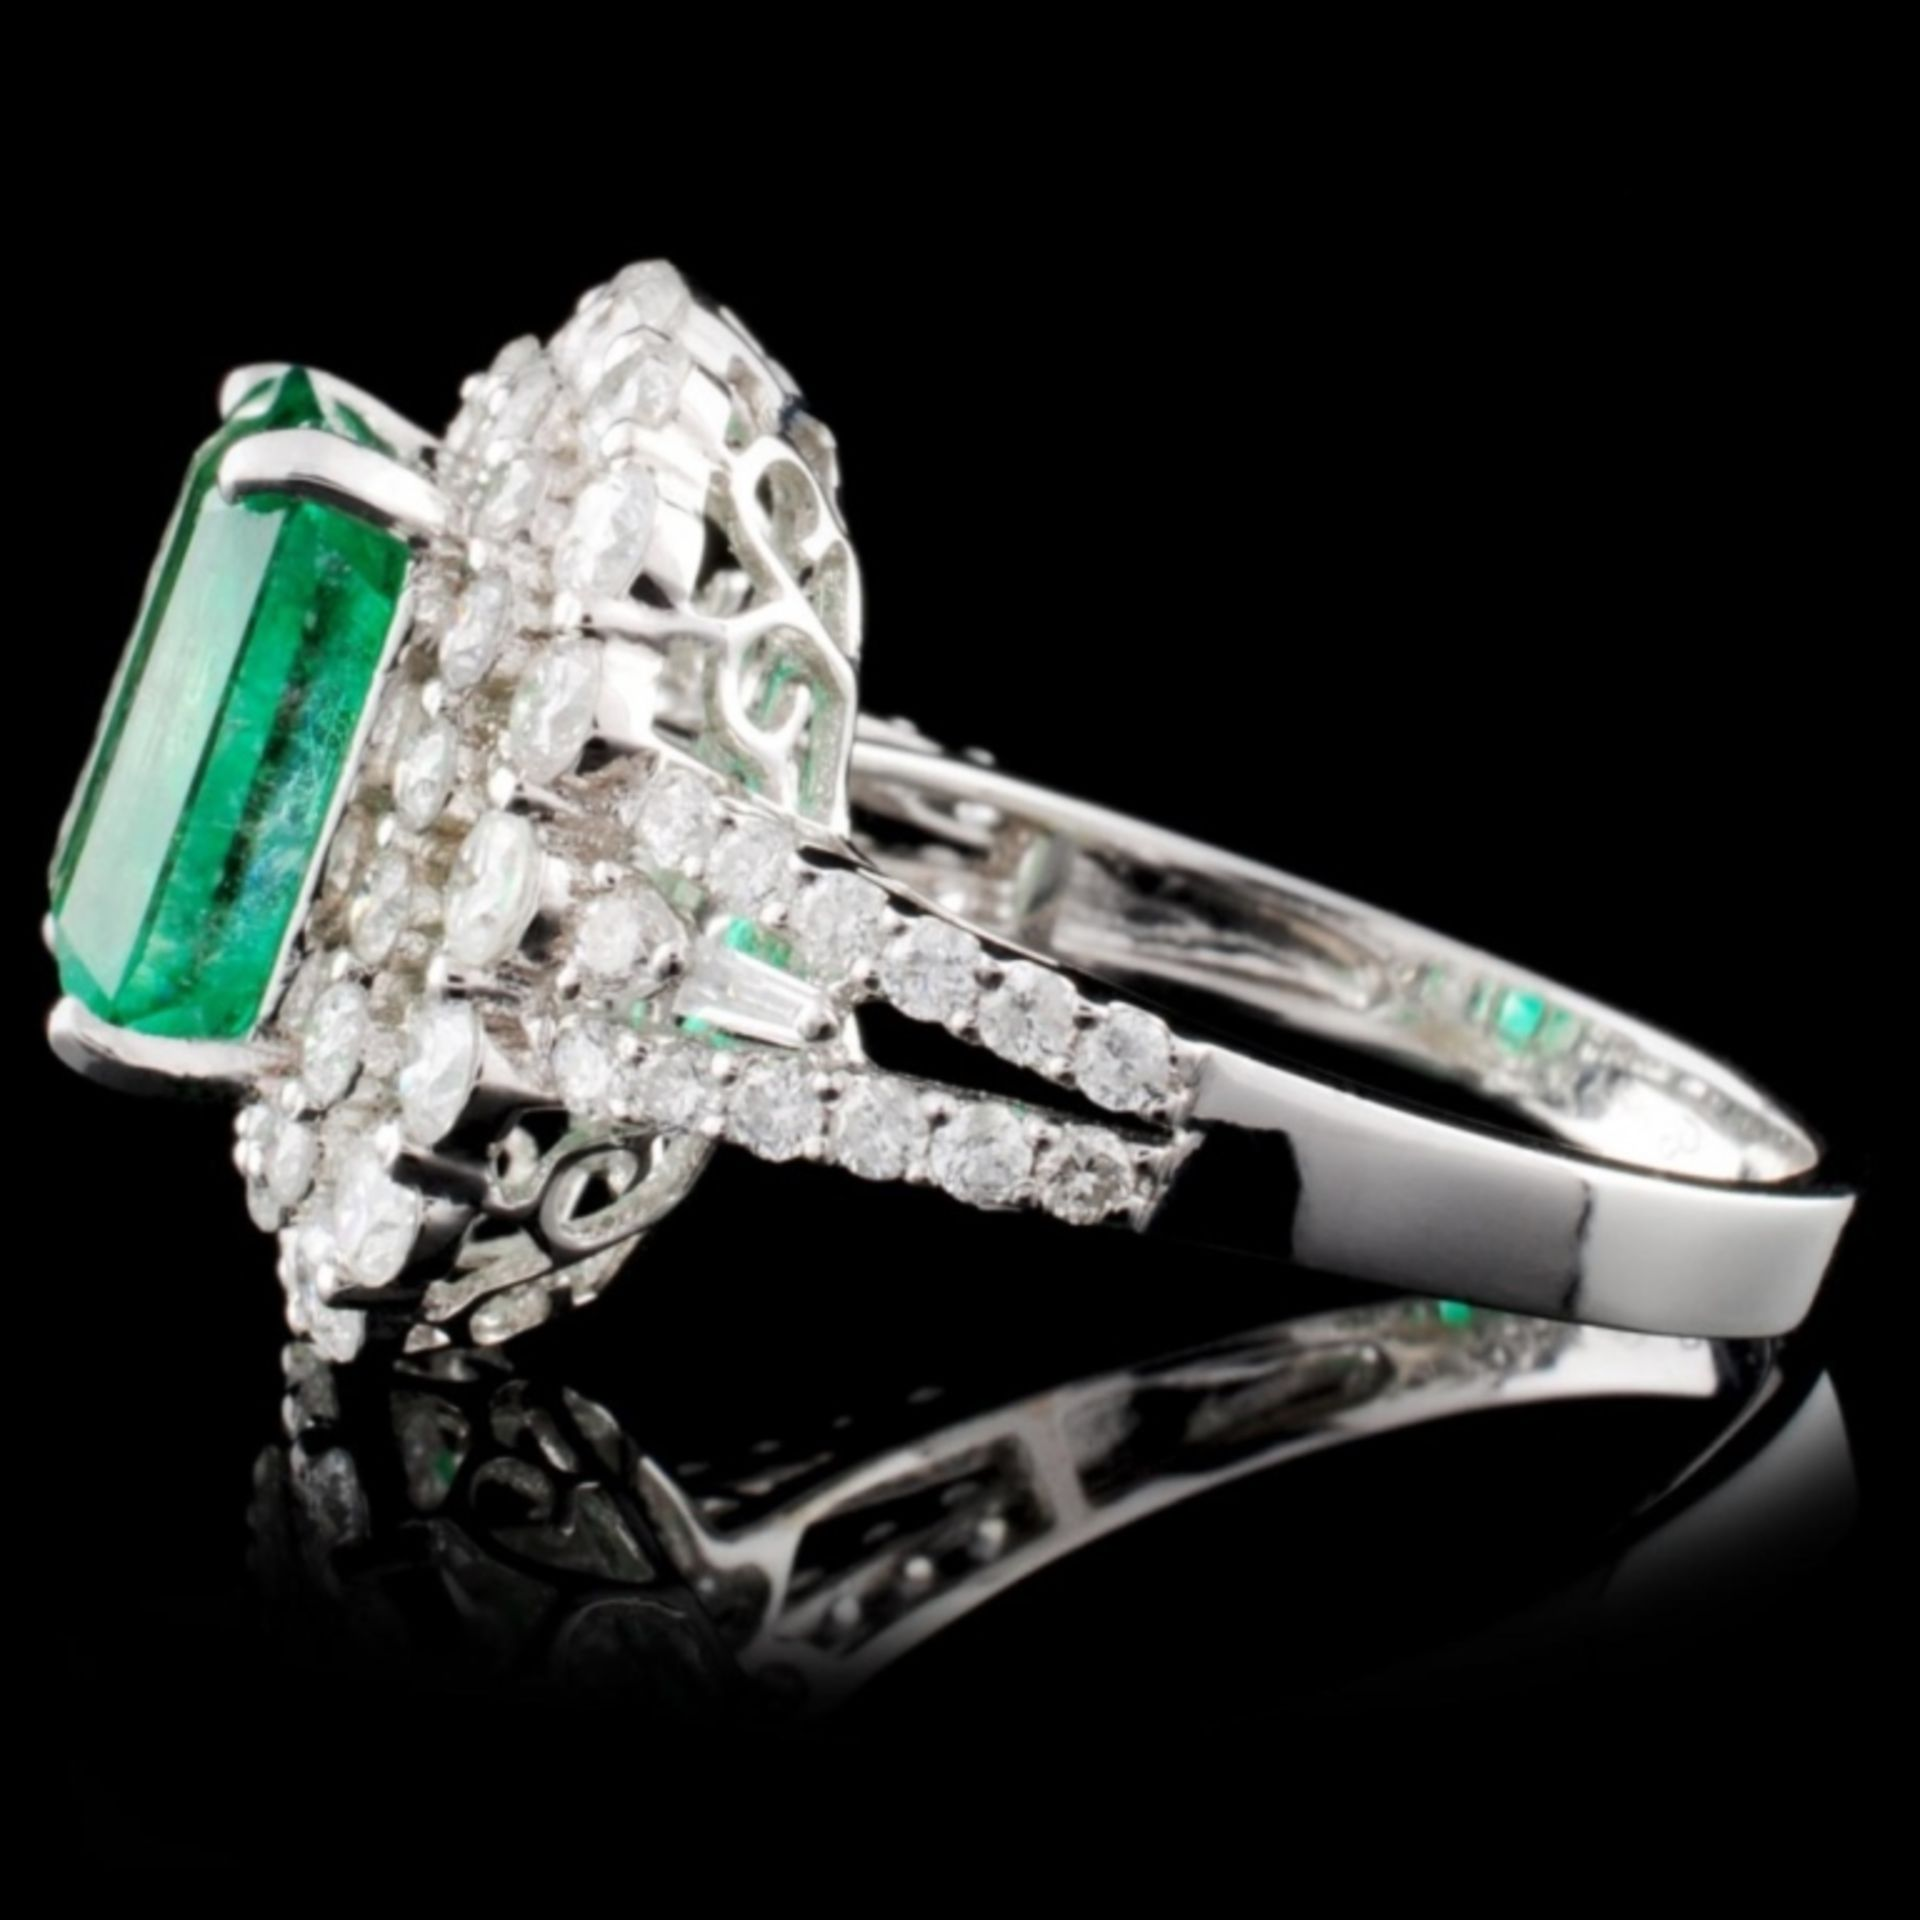 18K W Gold 3.54ct Emerald & 1.77ct Diamond Ring - Image 3 of 4